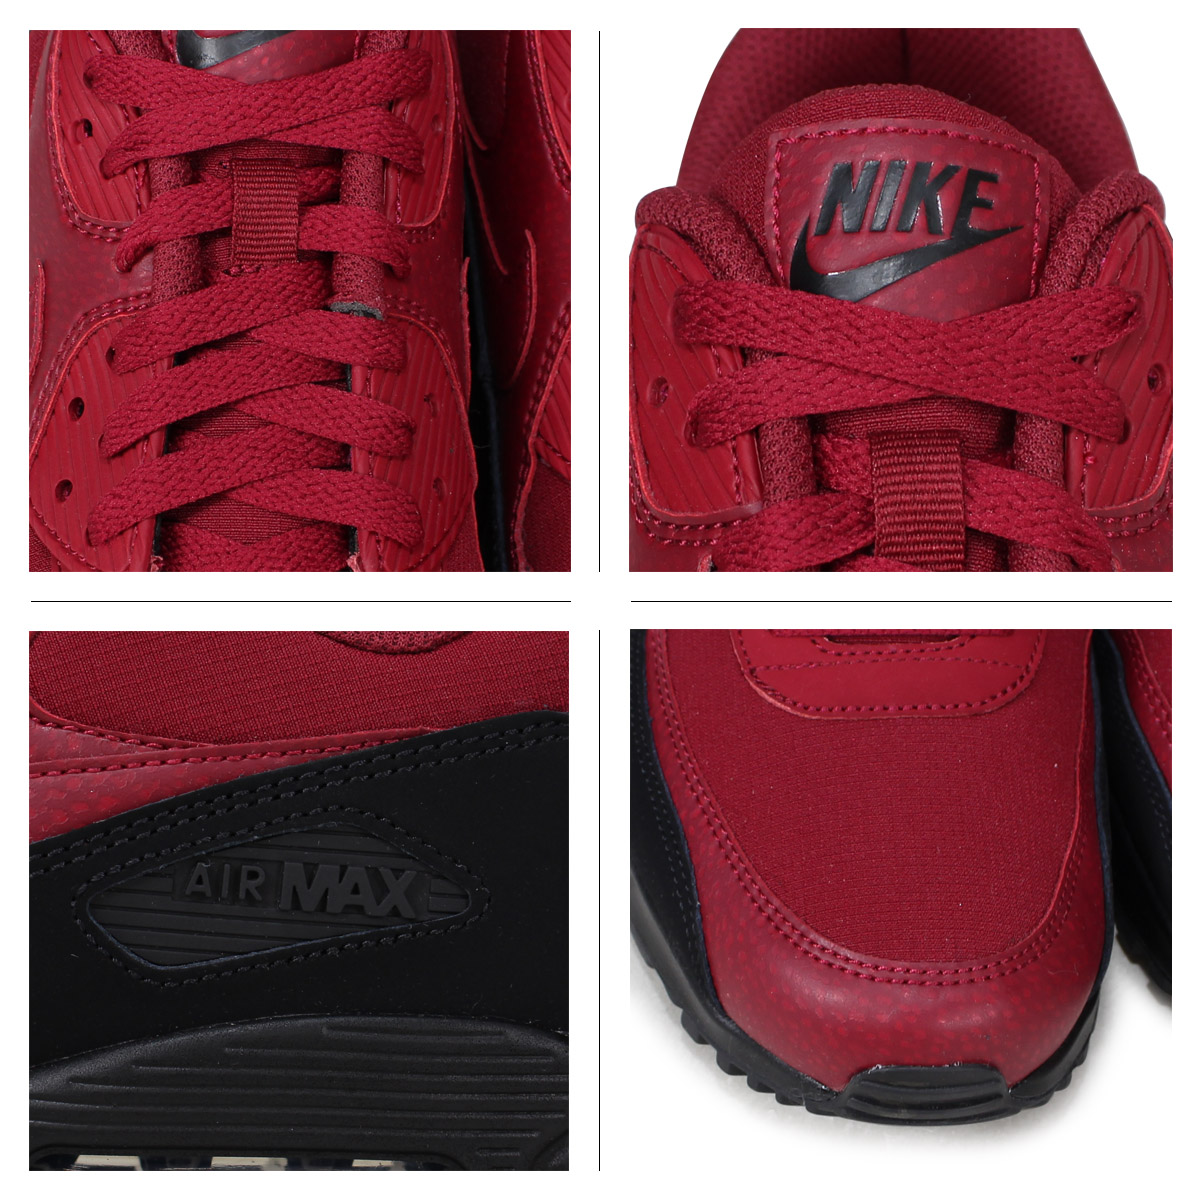 check out 16bd8 c9539 Nike NIKE Air Max 90 essential sneakers men AIR MAX 90 ESSENTIAL AJ1285-010  red